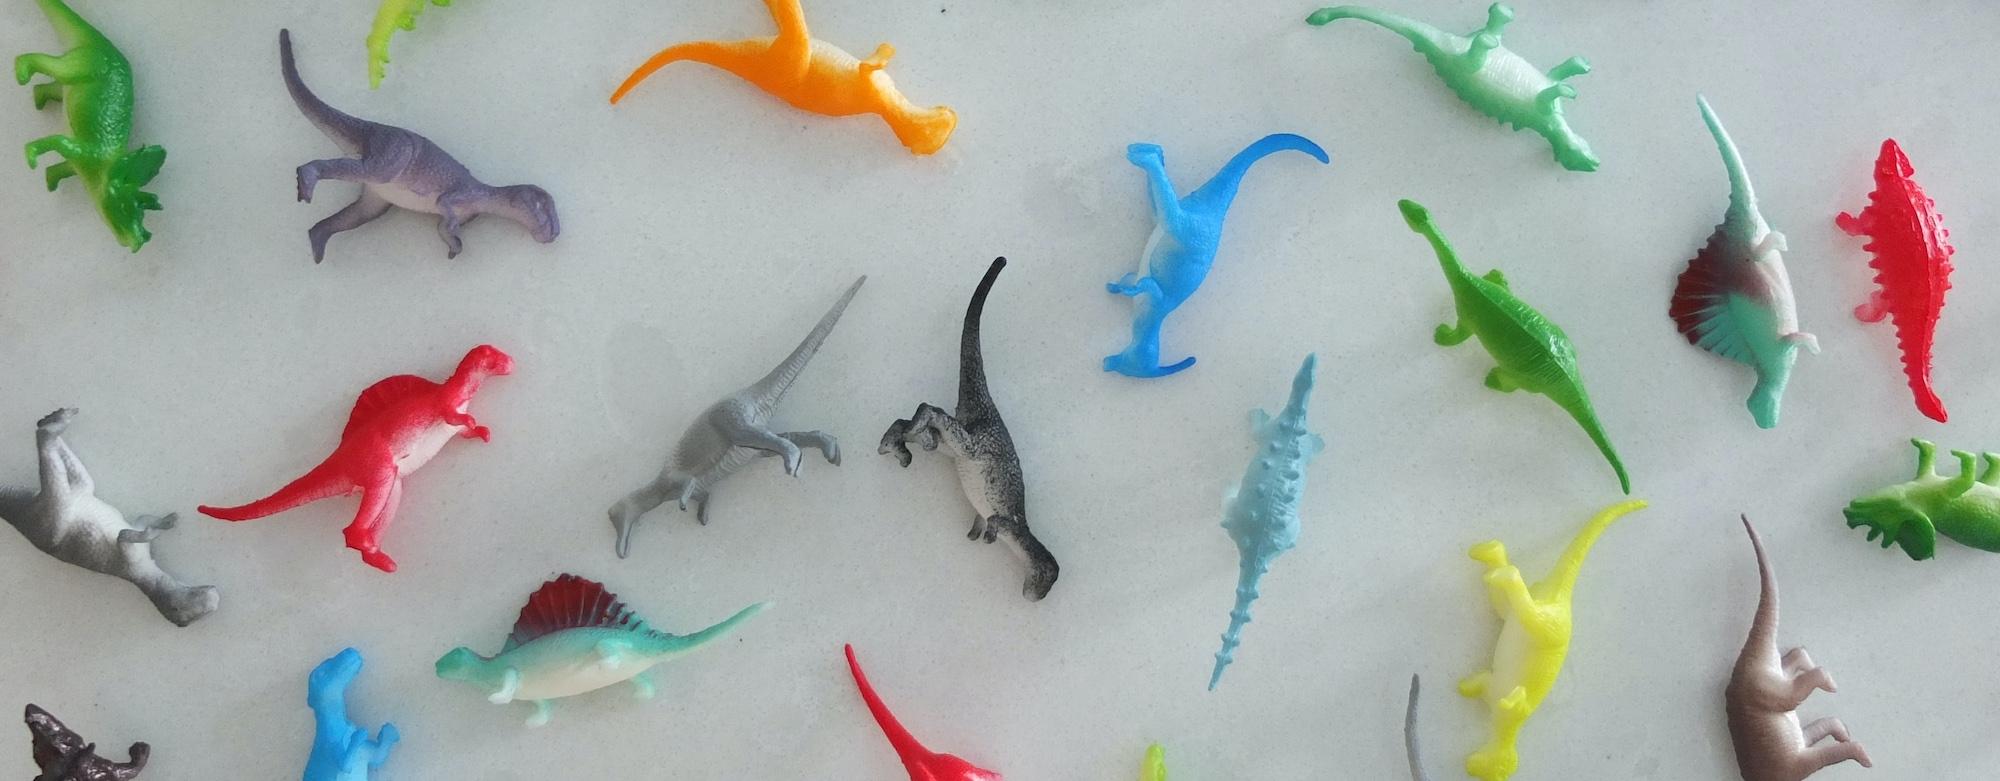 dinosaur toys scattered around